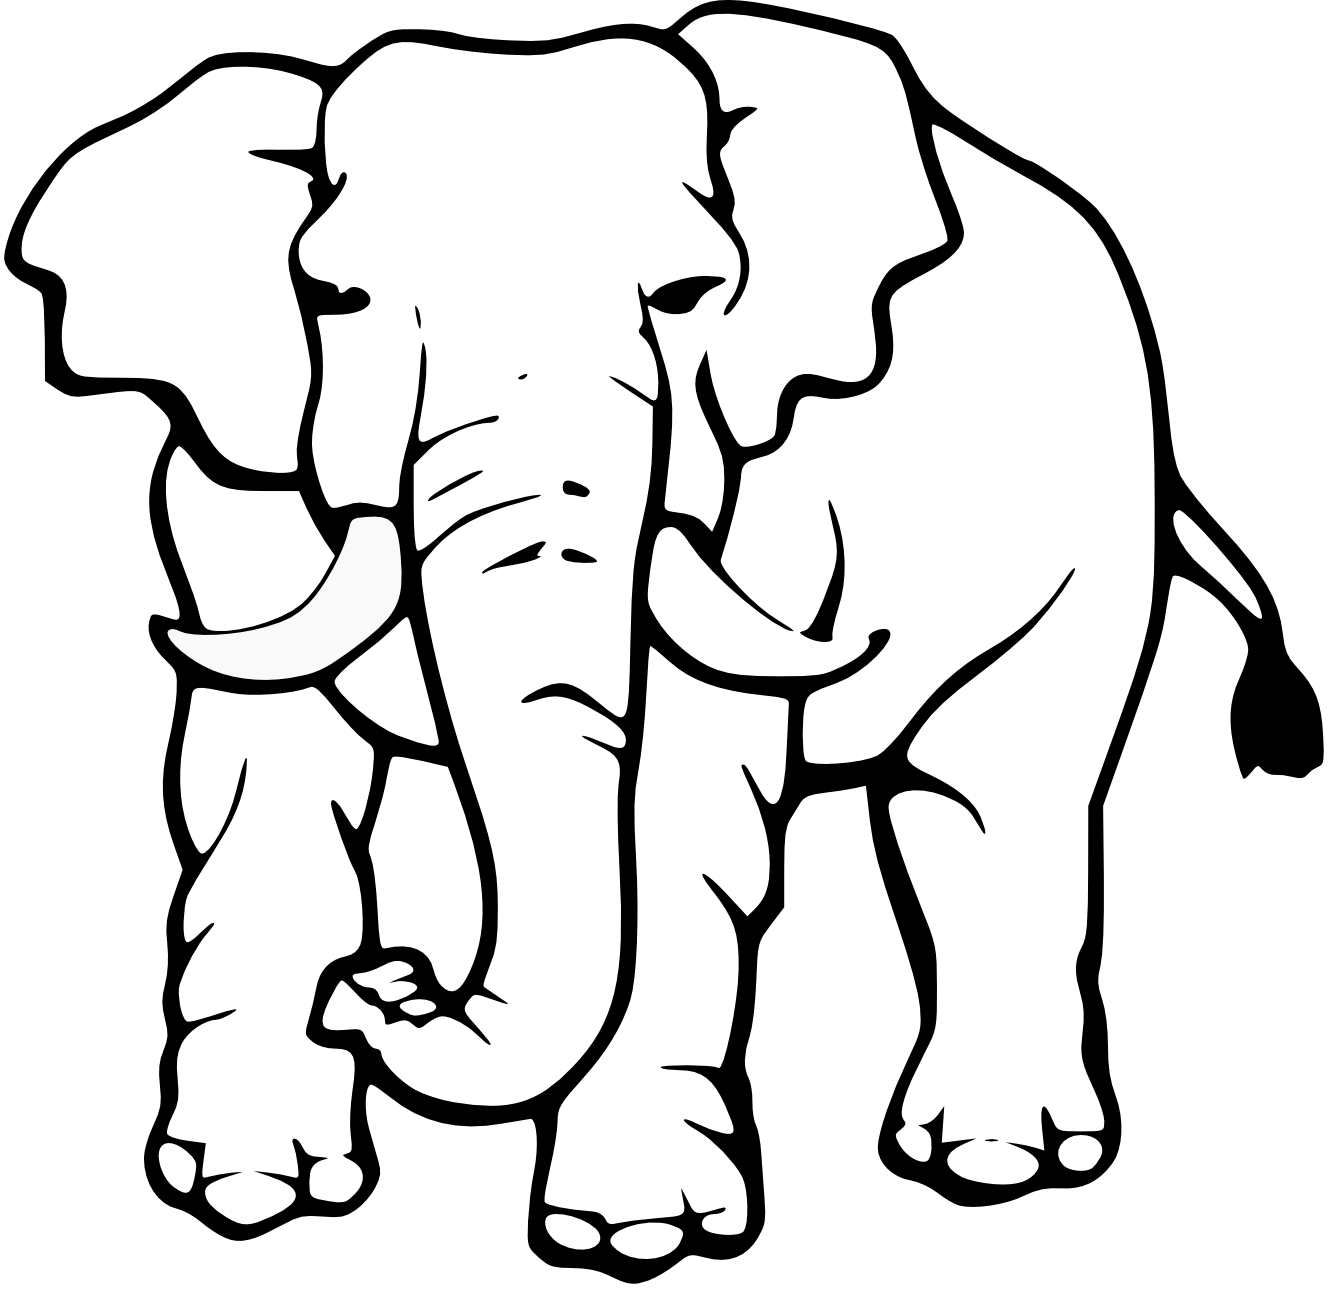 1331x1295 Monochrome Clipart Elephant